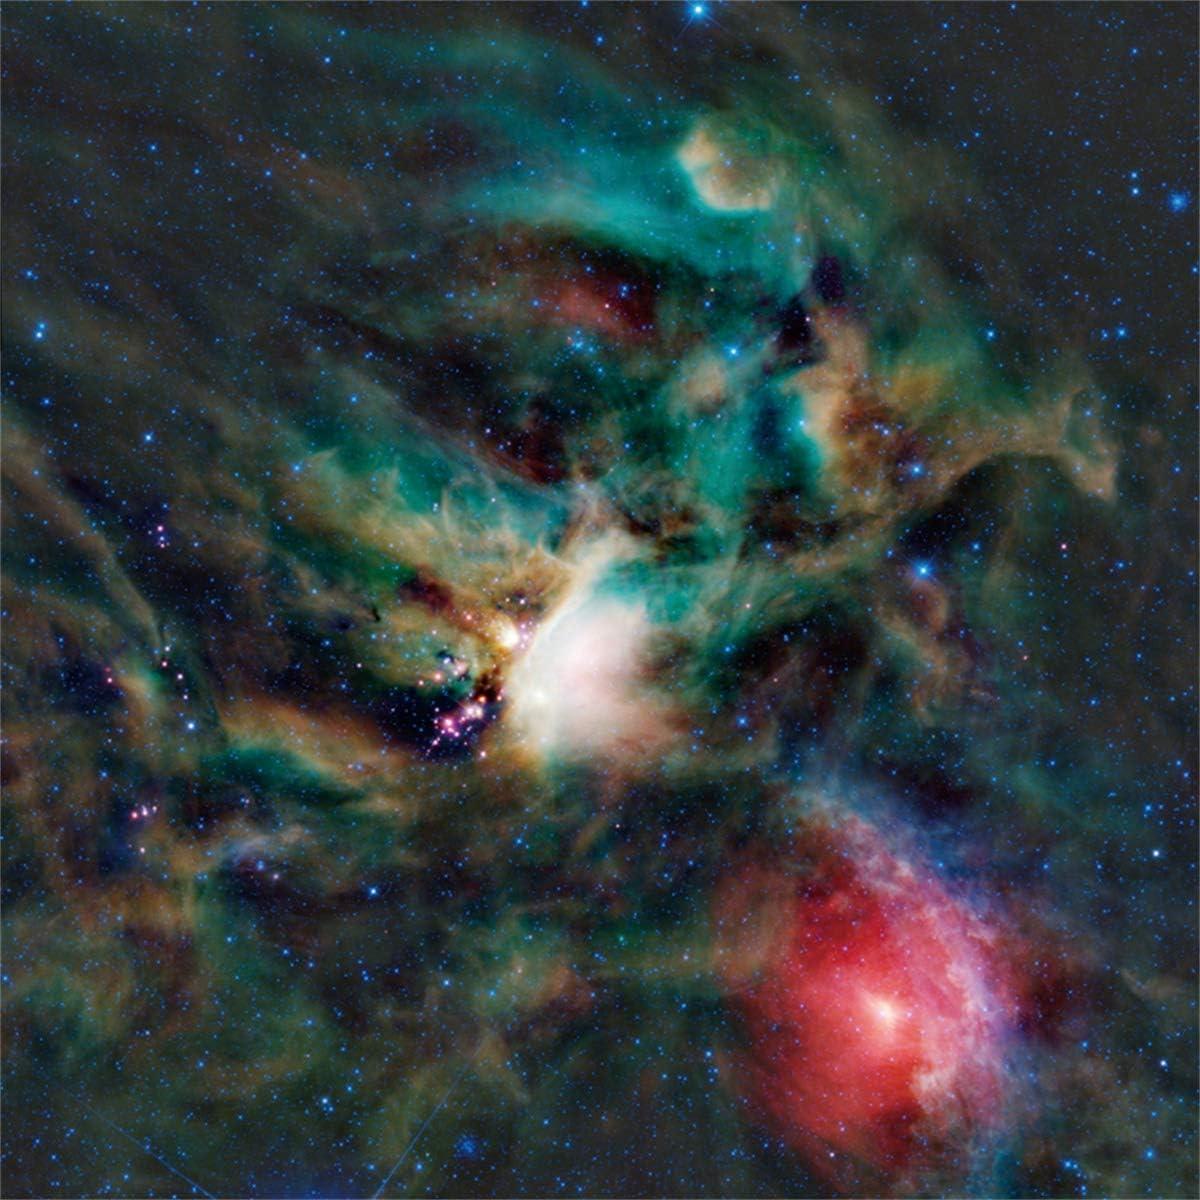 Yeele Galaxy Backdrop Nebula Night Sky Rho Astronomy Photography Background 10x10ft Sci-fi Events Decor Artistic Portrait YouTube Channel Photoshoot Props